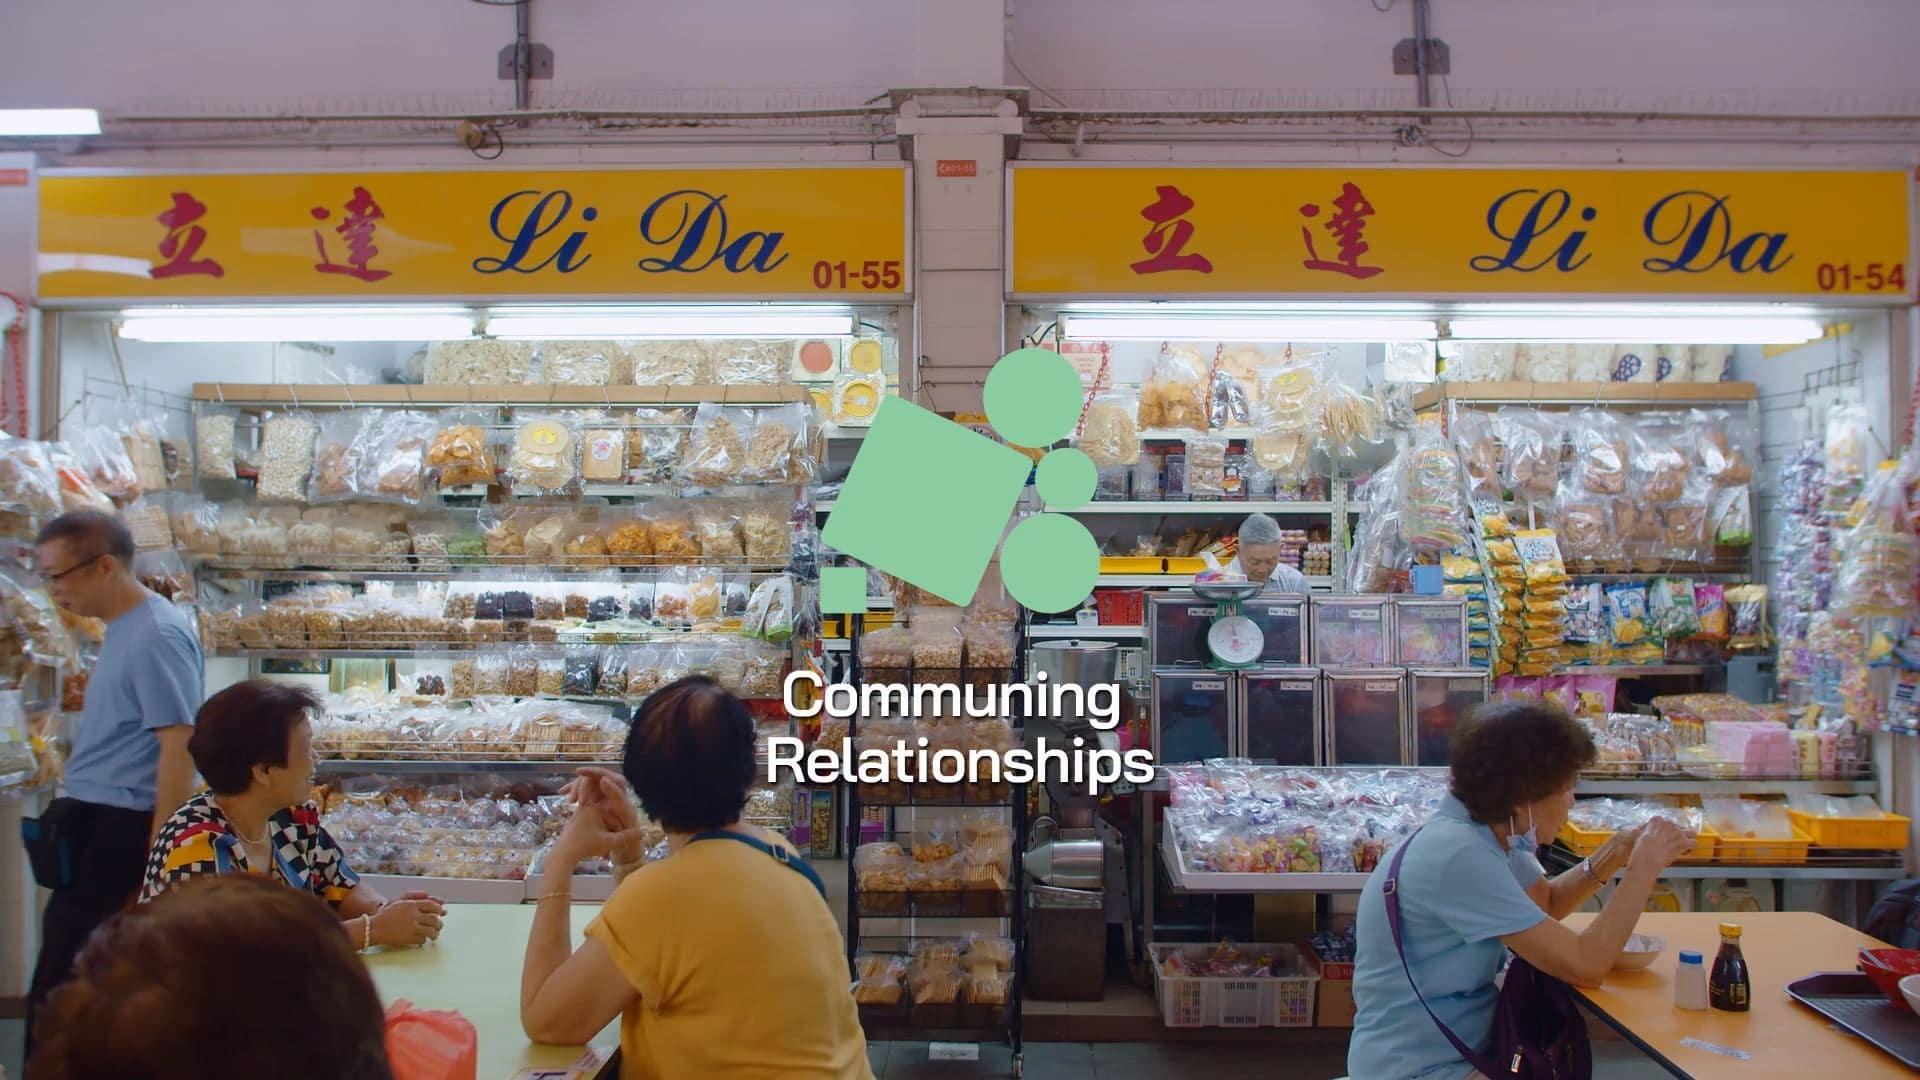 Communing Relationships